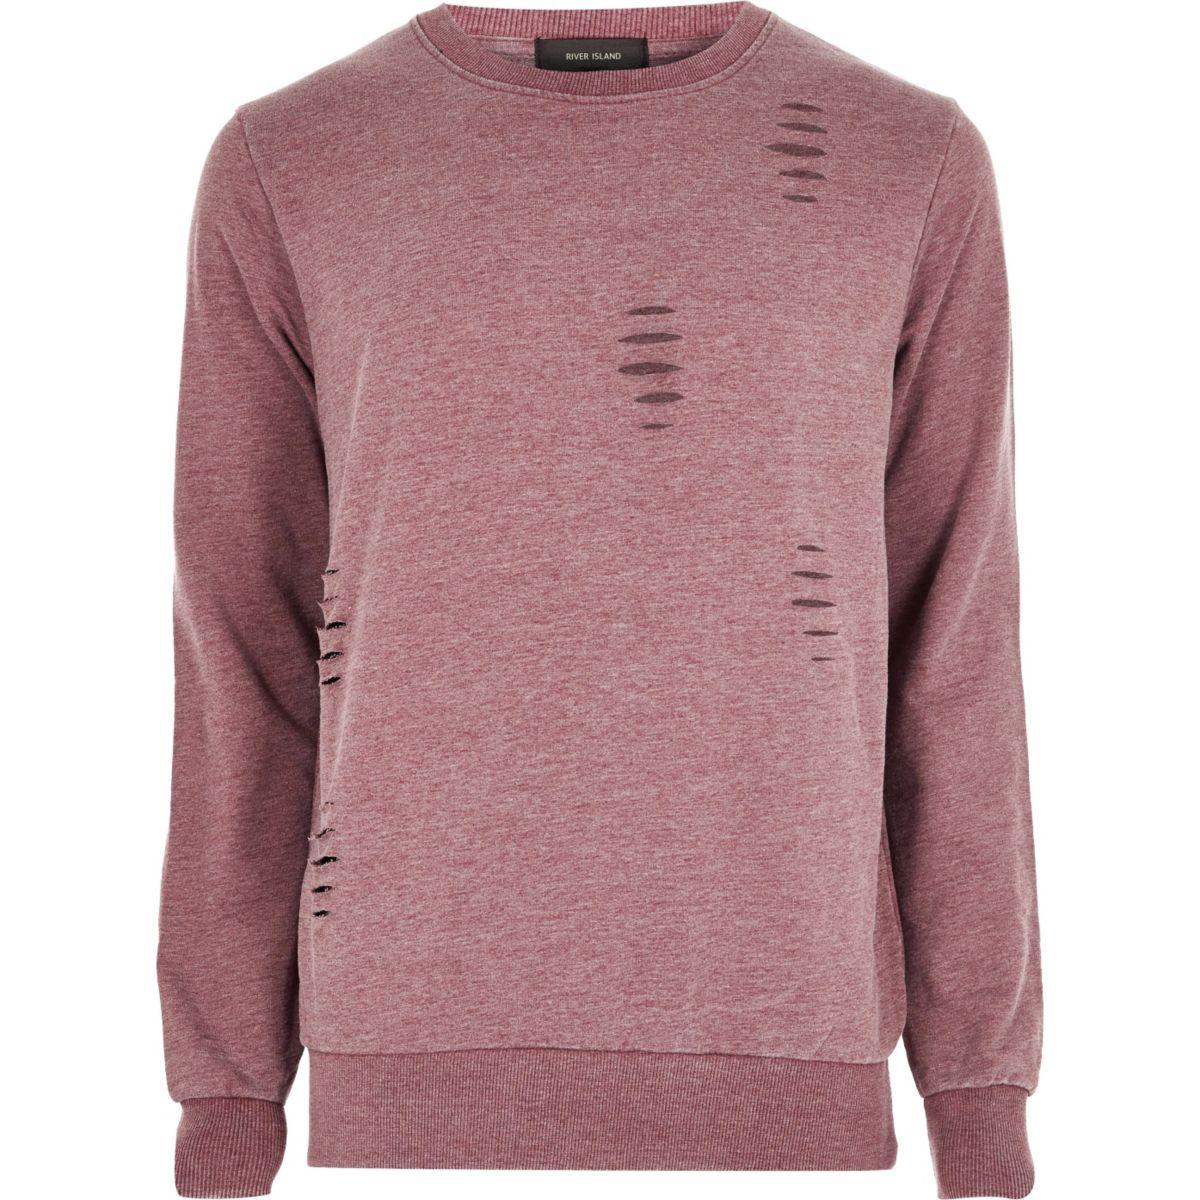 Red ripped crew neck sweatshirt